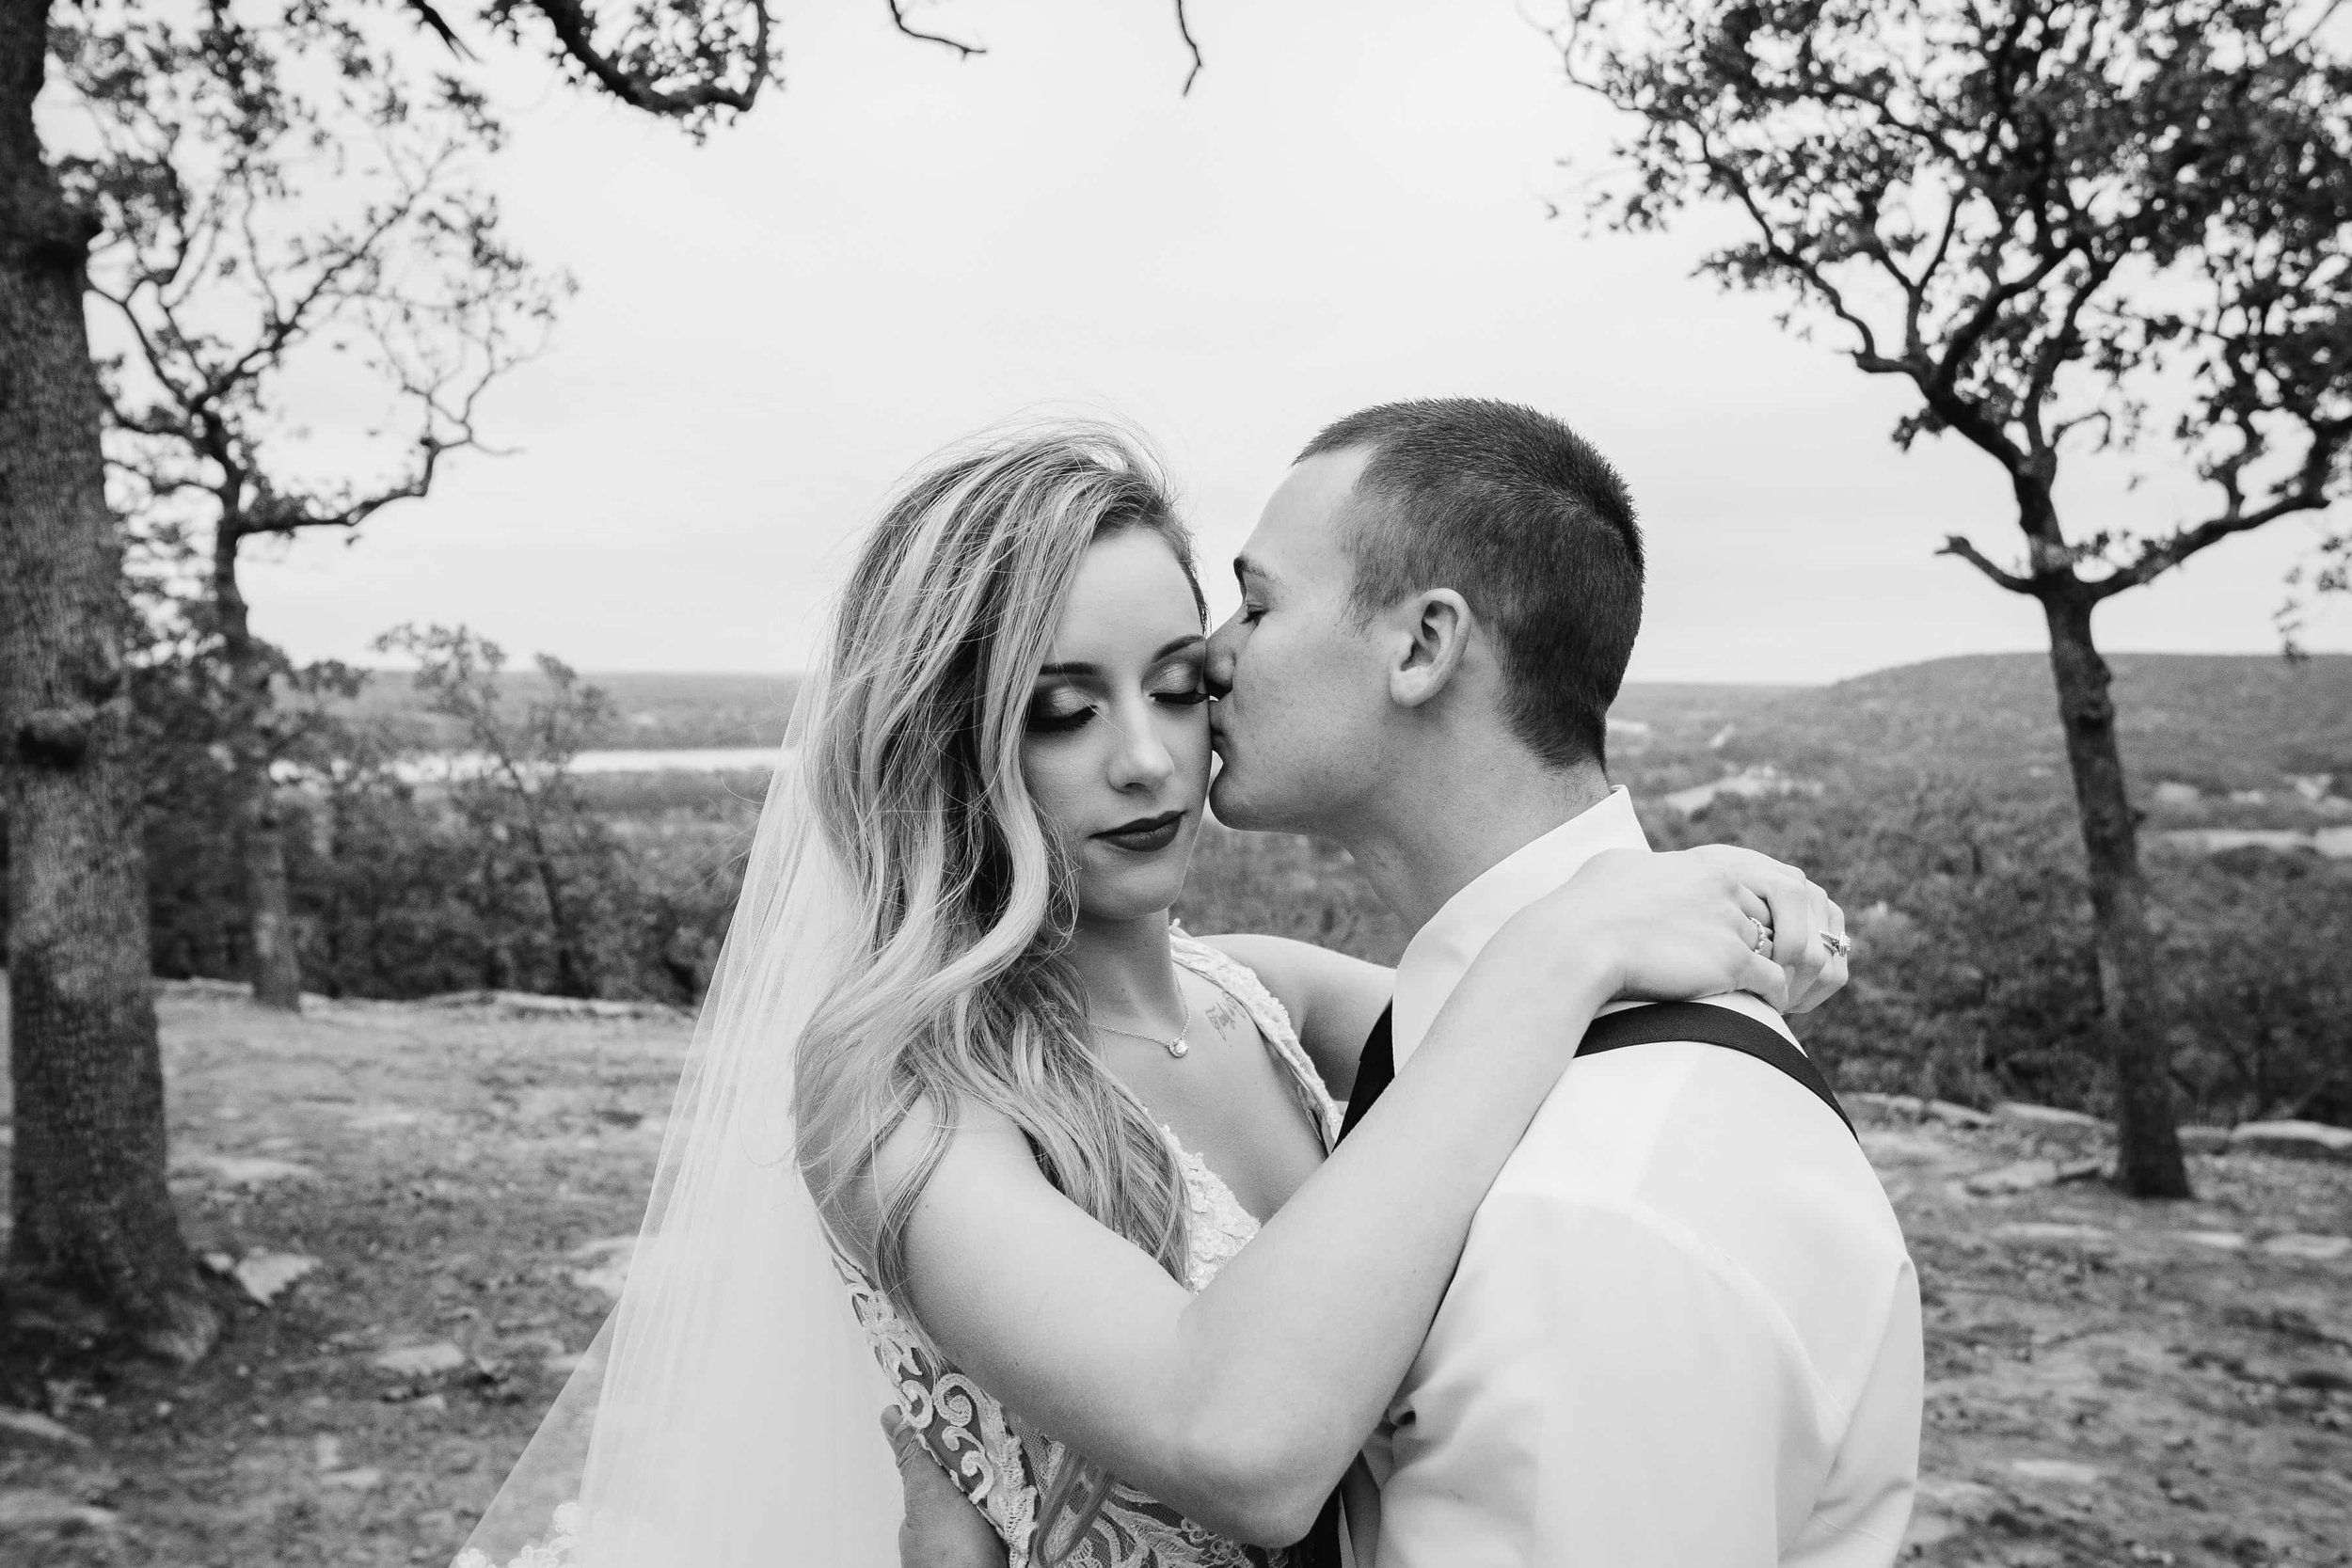 Outdoor Wedding Venue Tulsa 15-min.jpg